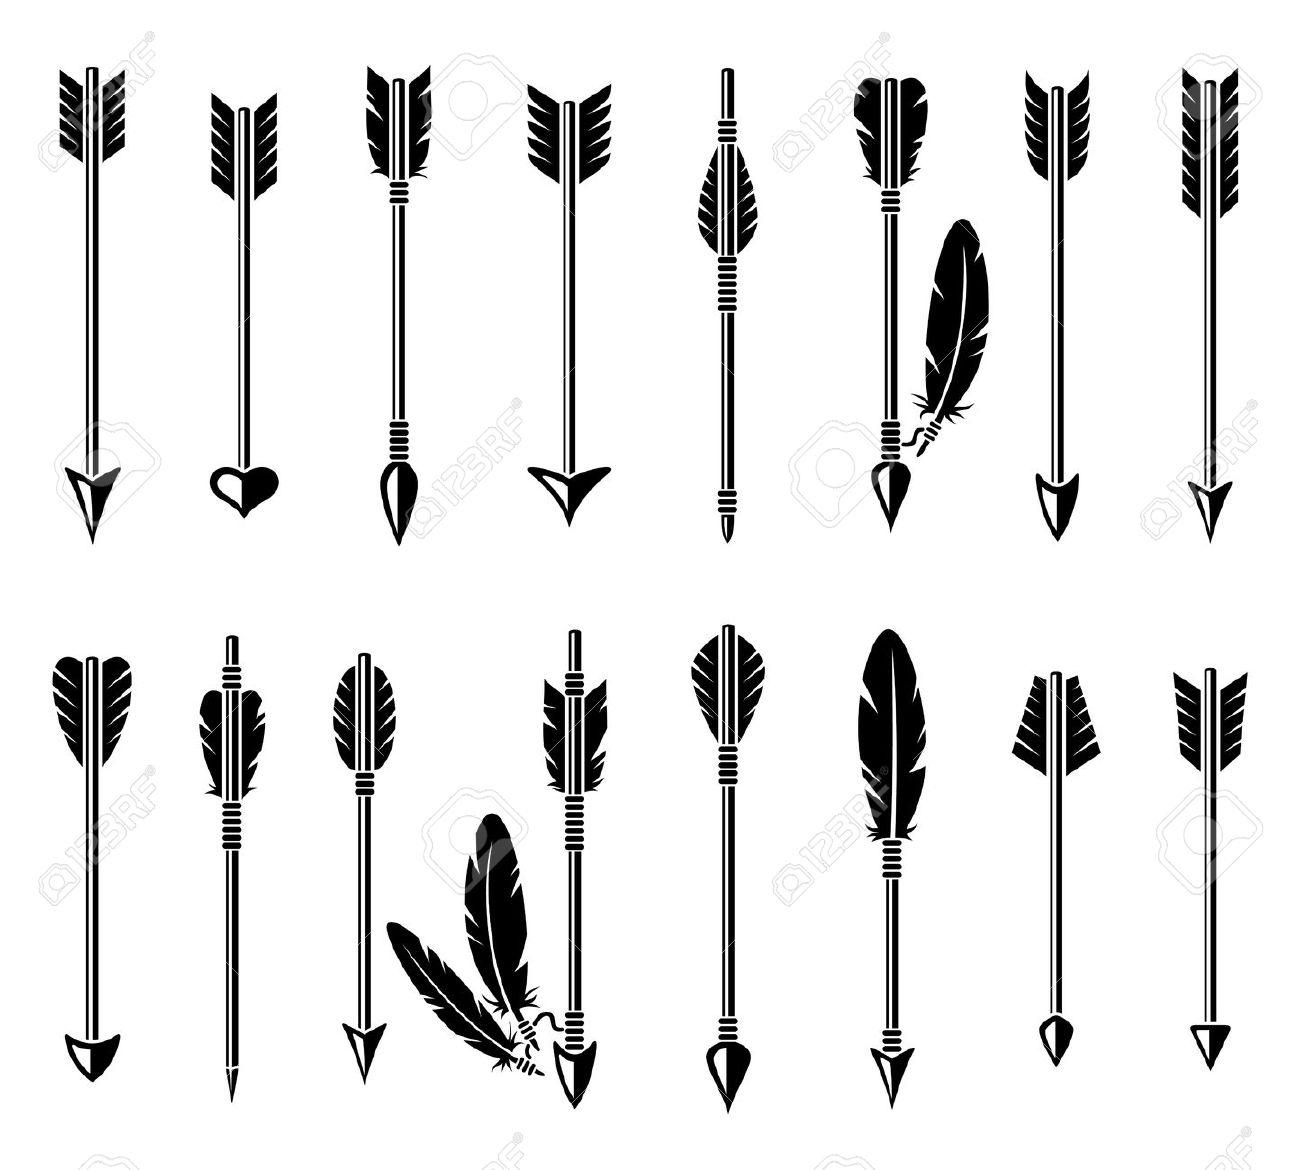 Arrow clipart feather. Station